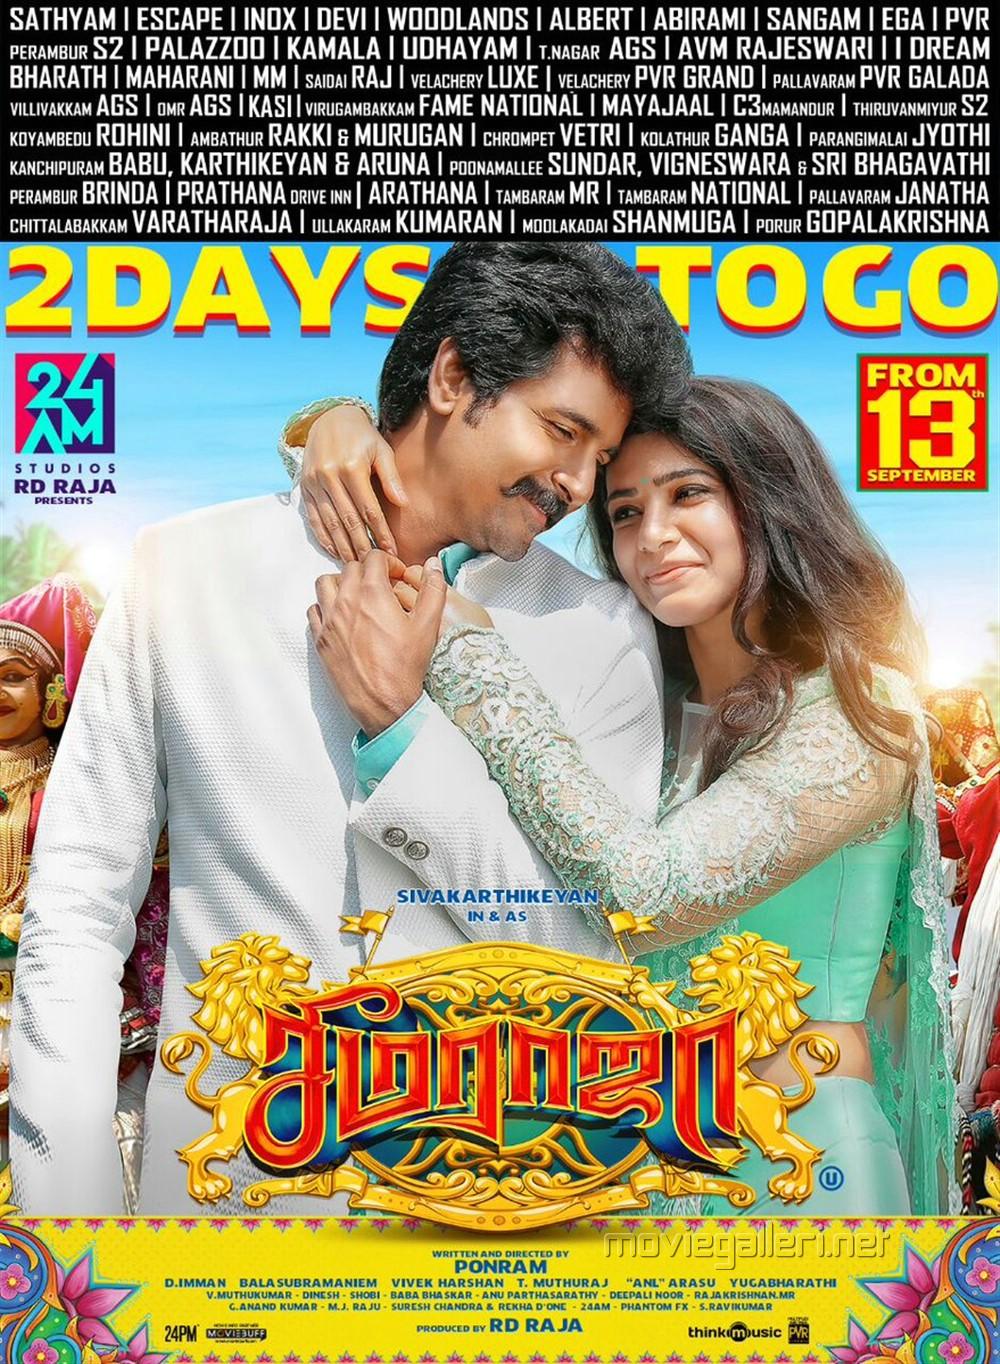 Sivakarthikeyan Samantha Seema Raja Movie 2 Days to Go Poster